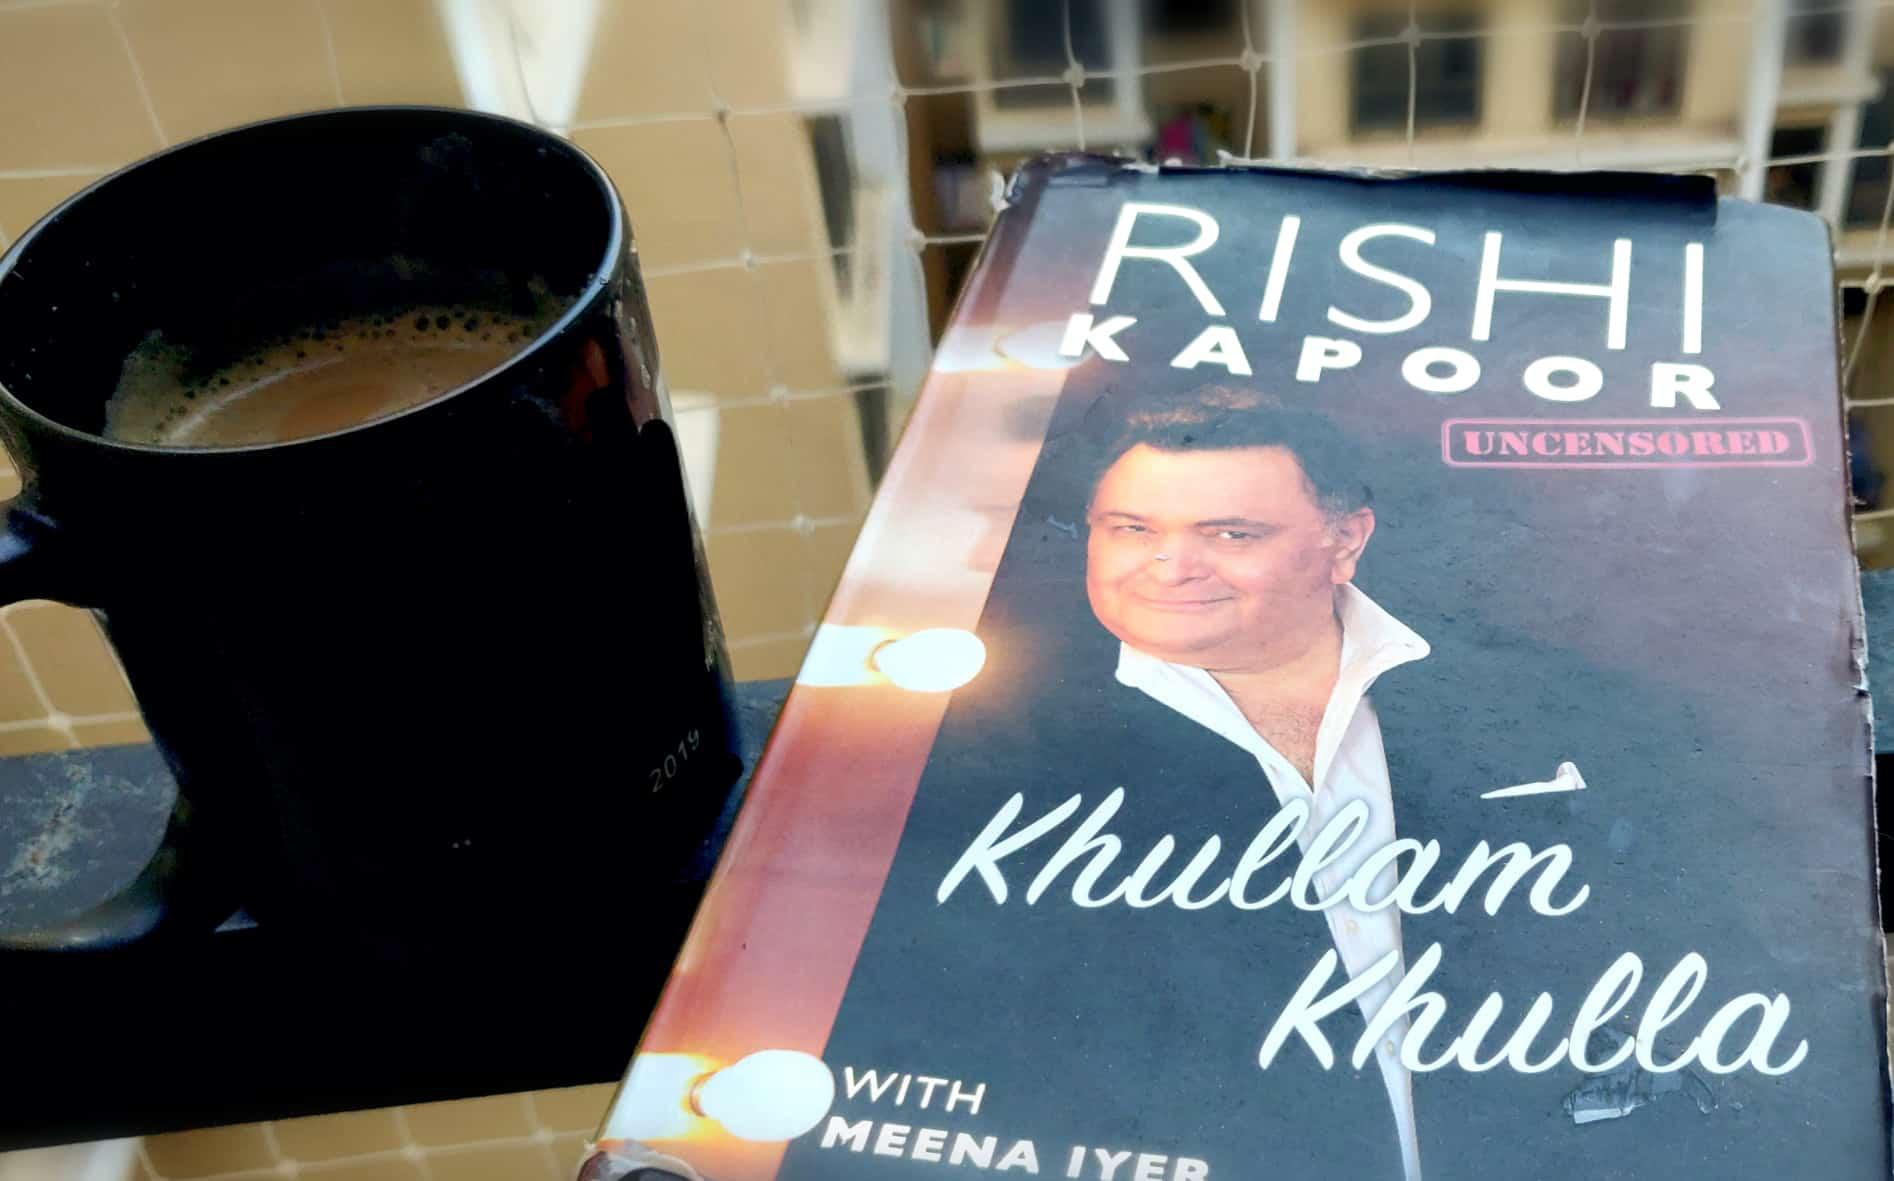 Khullam Khulla Rishi Kapoor Uncensored Meena Iyer Author Actor Book Review Rating Summary